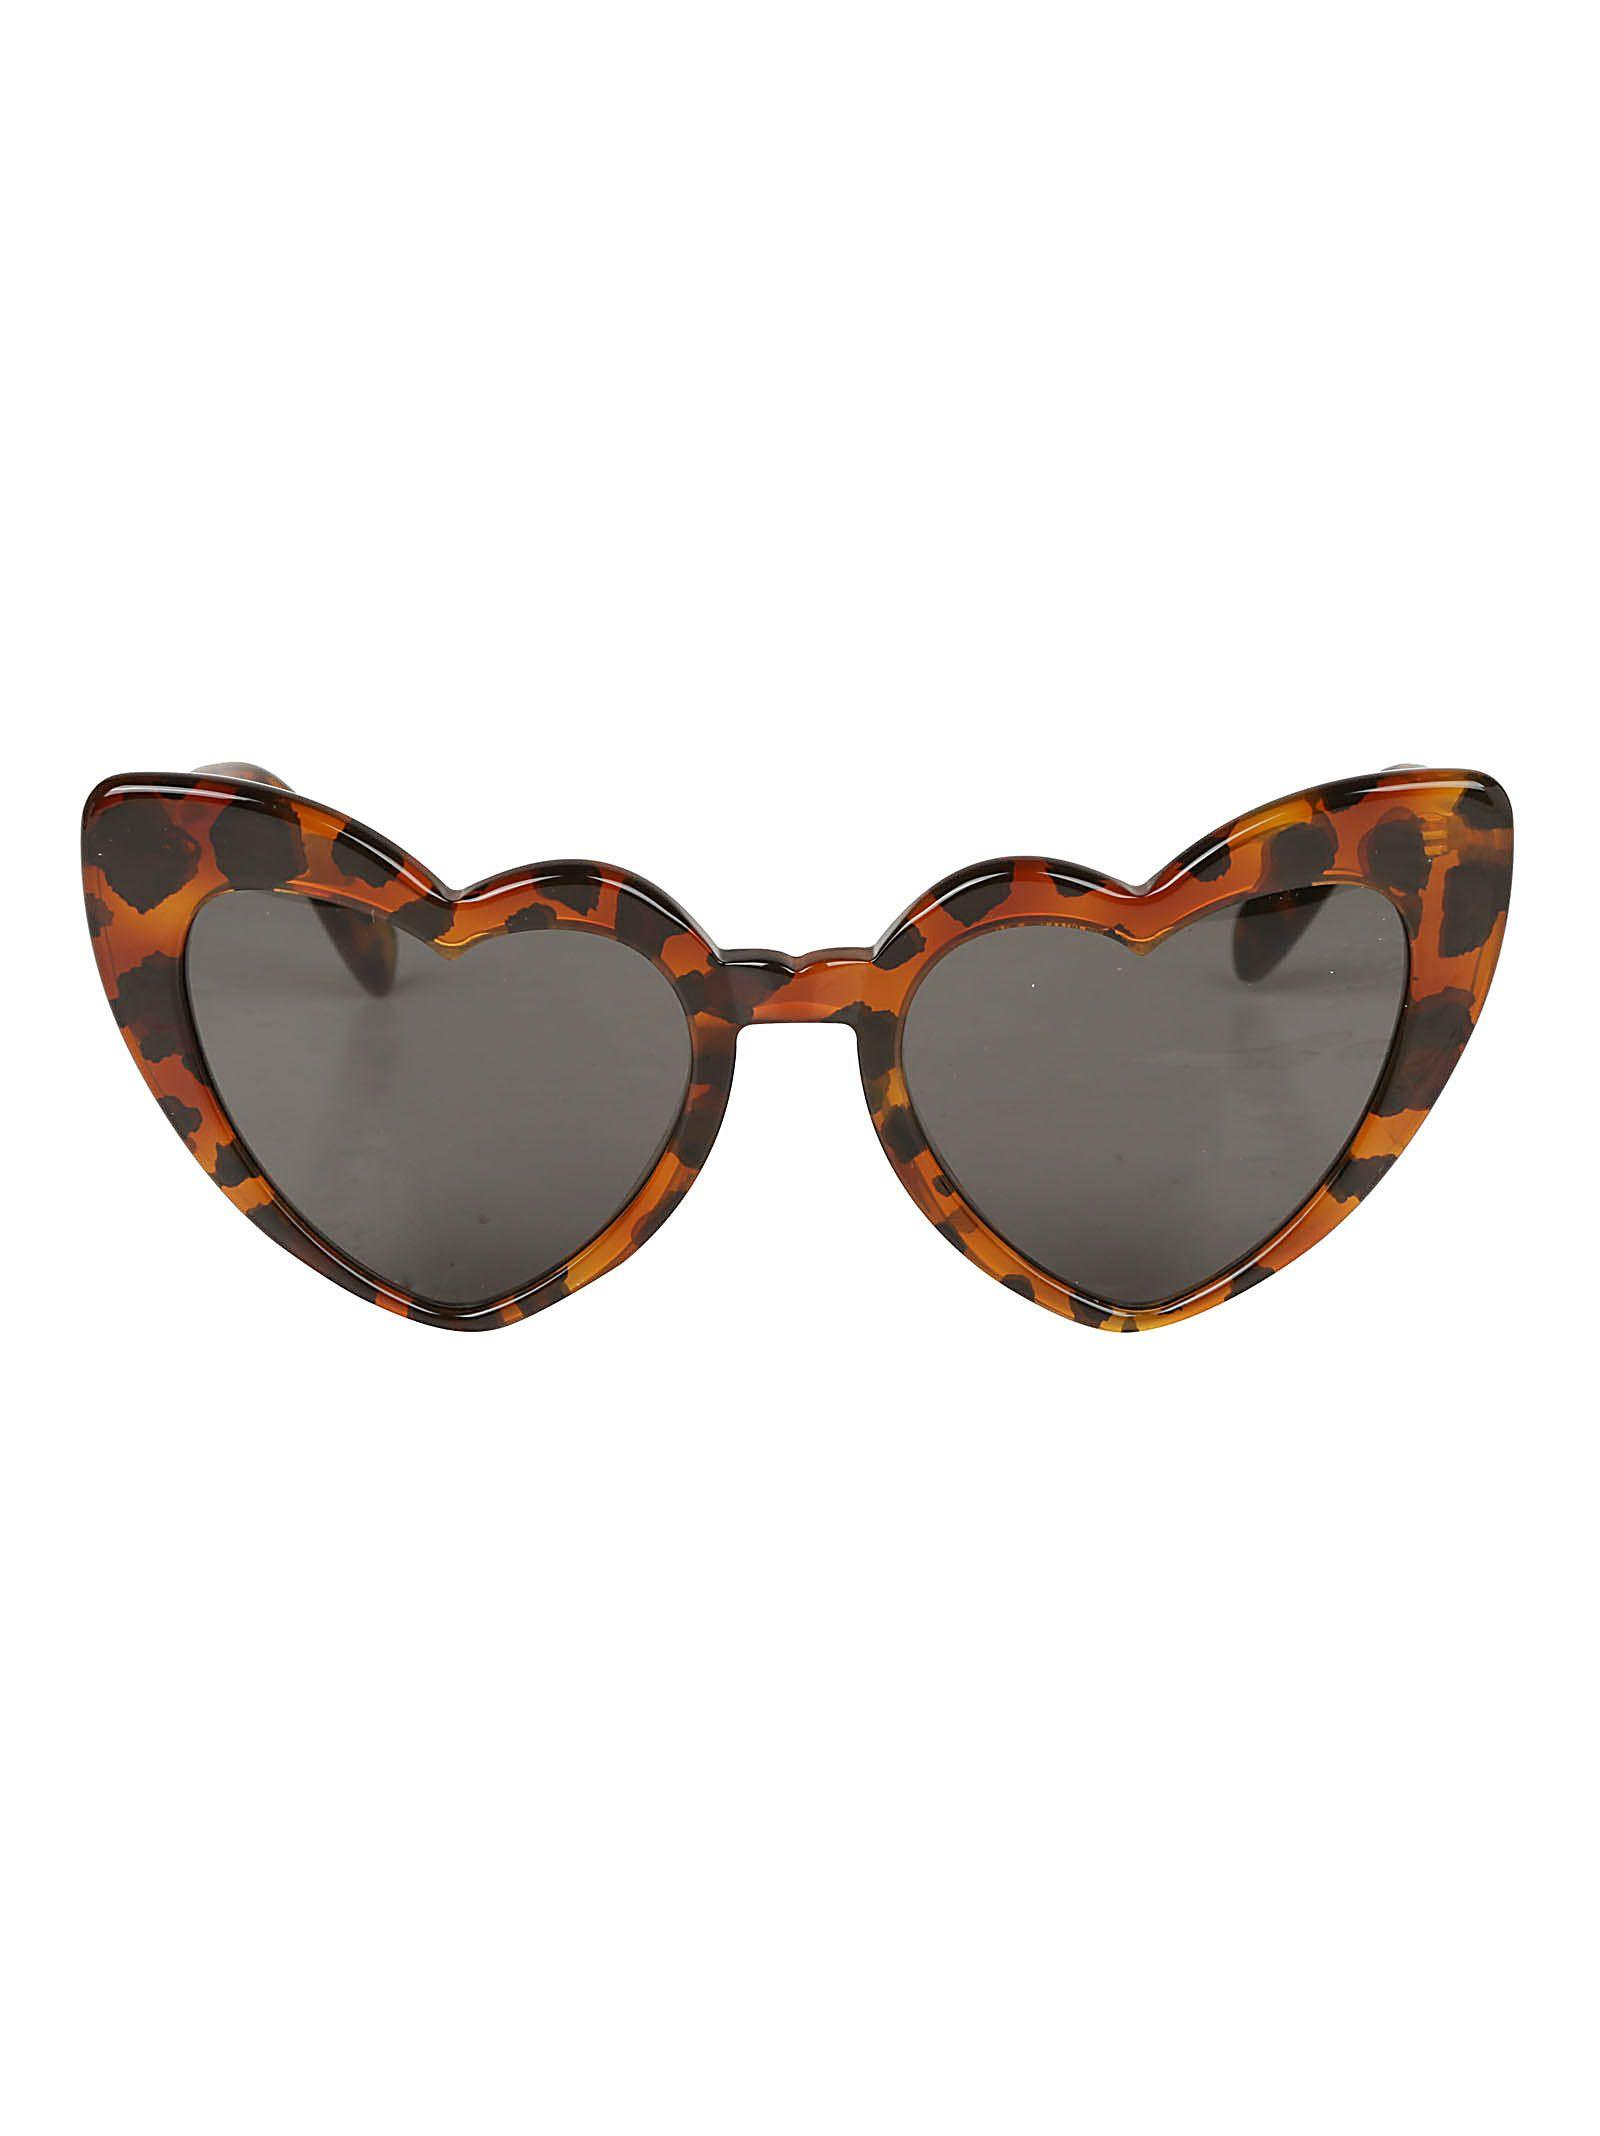 Saint Laurent Loulou Sunglasses In Brown Leopard Grey